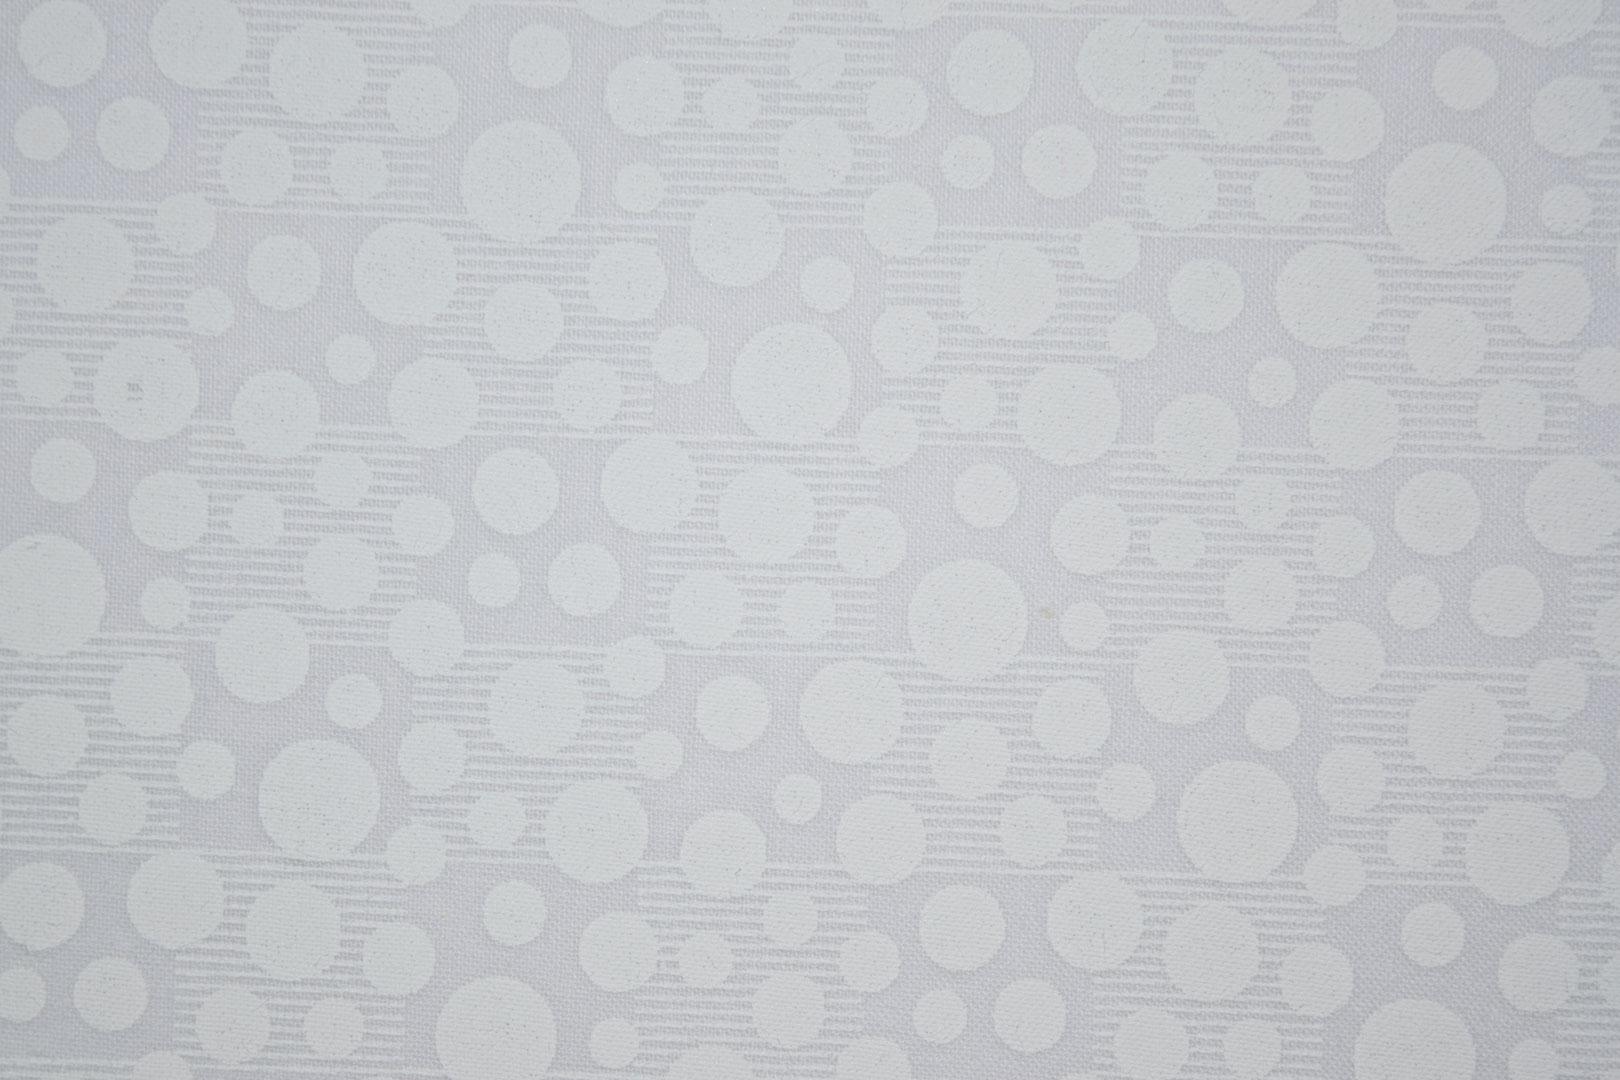 "149_44261_ww   45"" 68/68, 100% Carded Cotton"